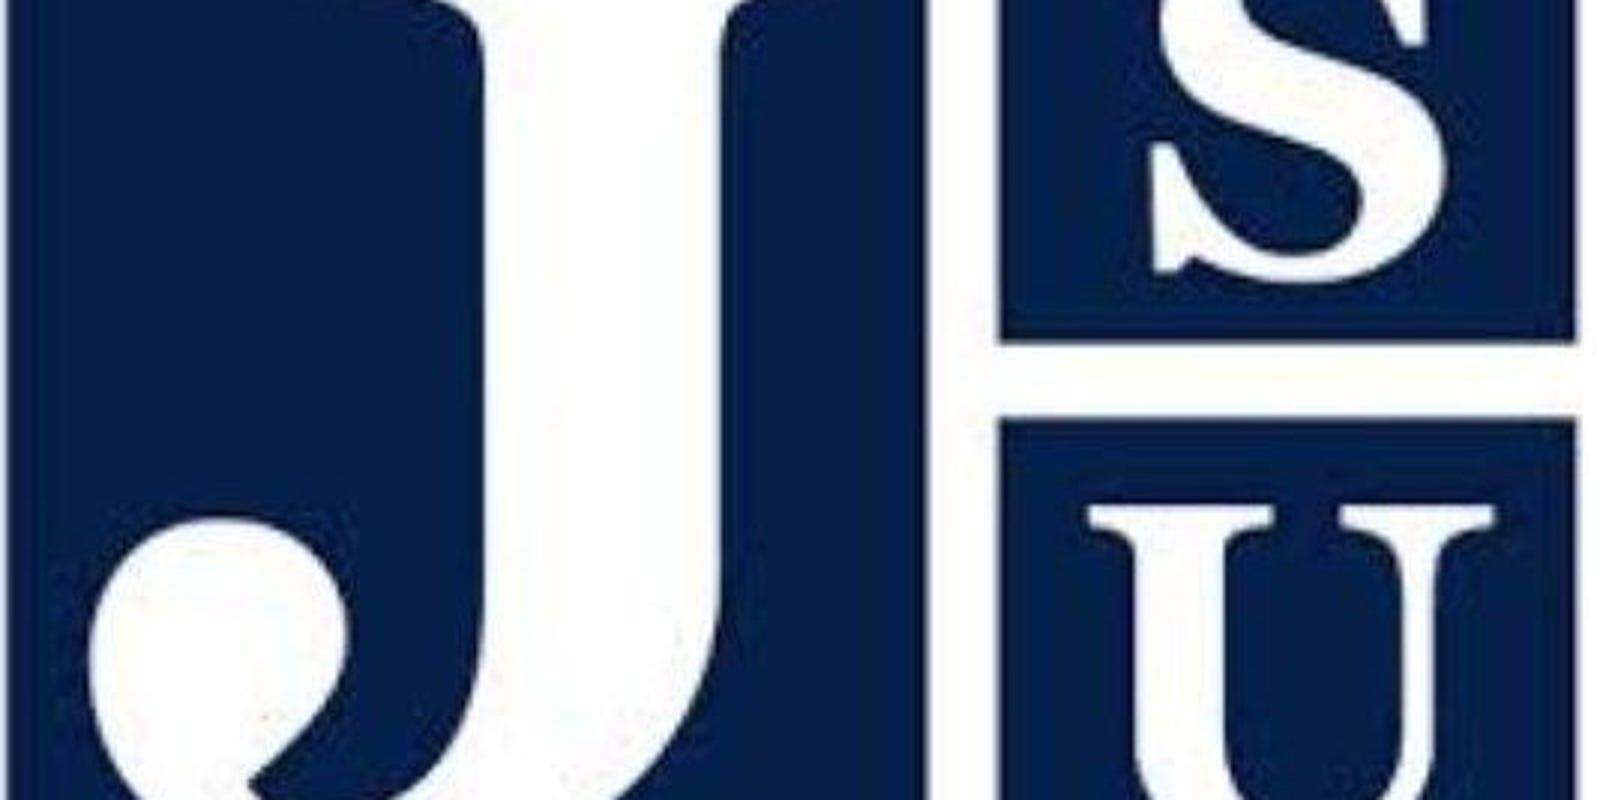 Jsettes clipart svg free library 9 JSU Prancing J-Settes kicked off squad svg free library